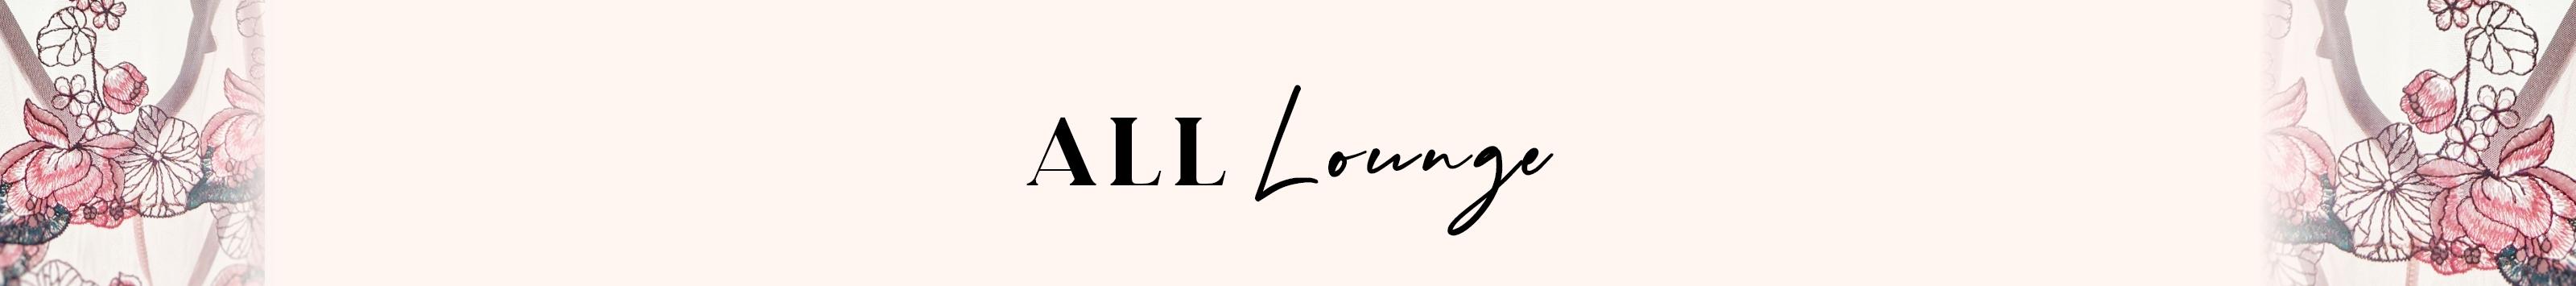 banner-category-lounge-alllounge-2.jpg